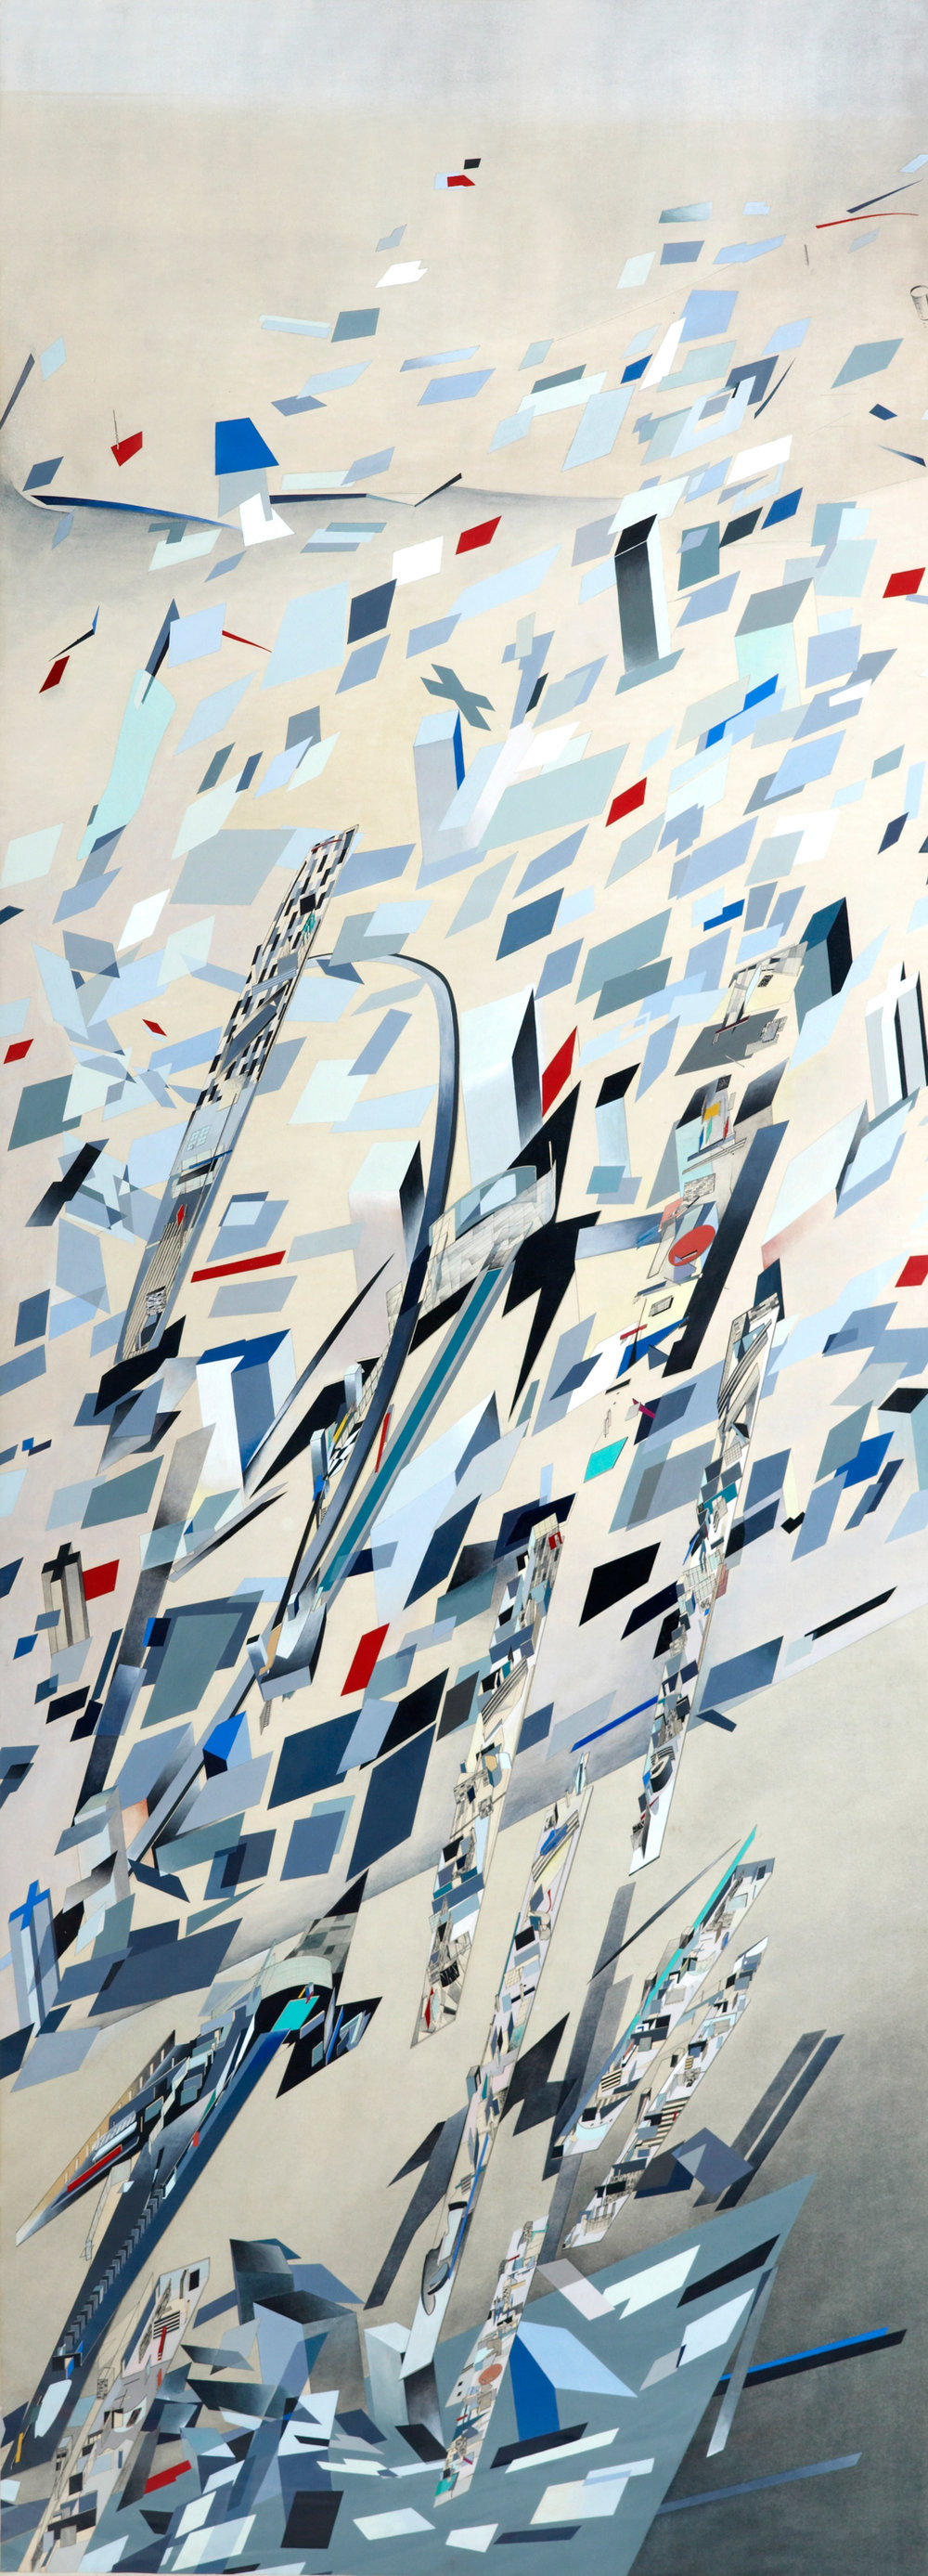 zaha-hadid-exhibition-drawings-serpentine-galleries_dezeen_2364_col_6.jpg